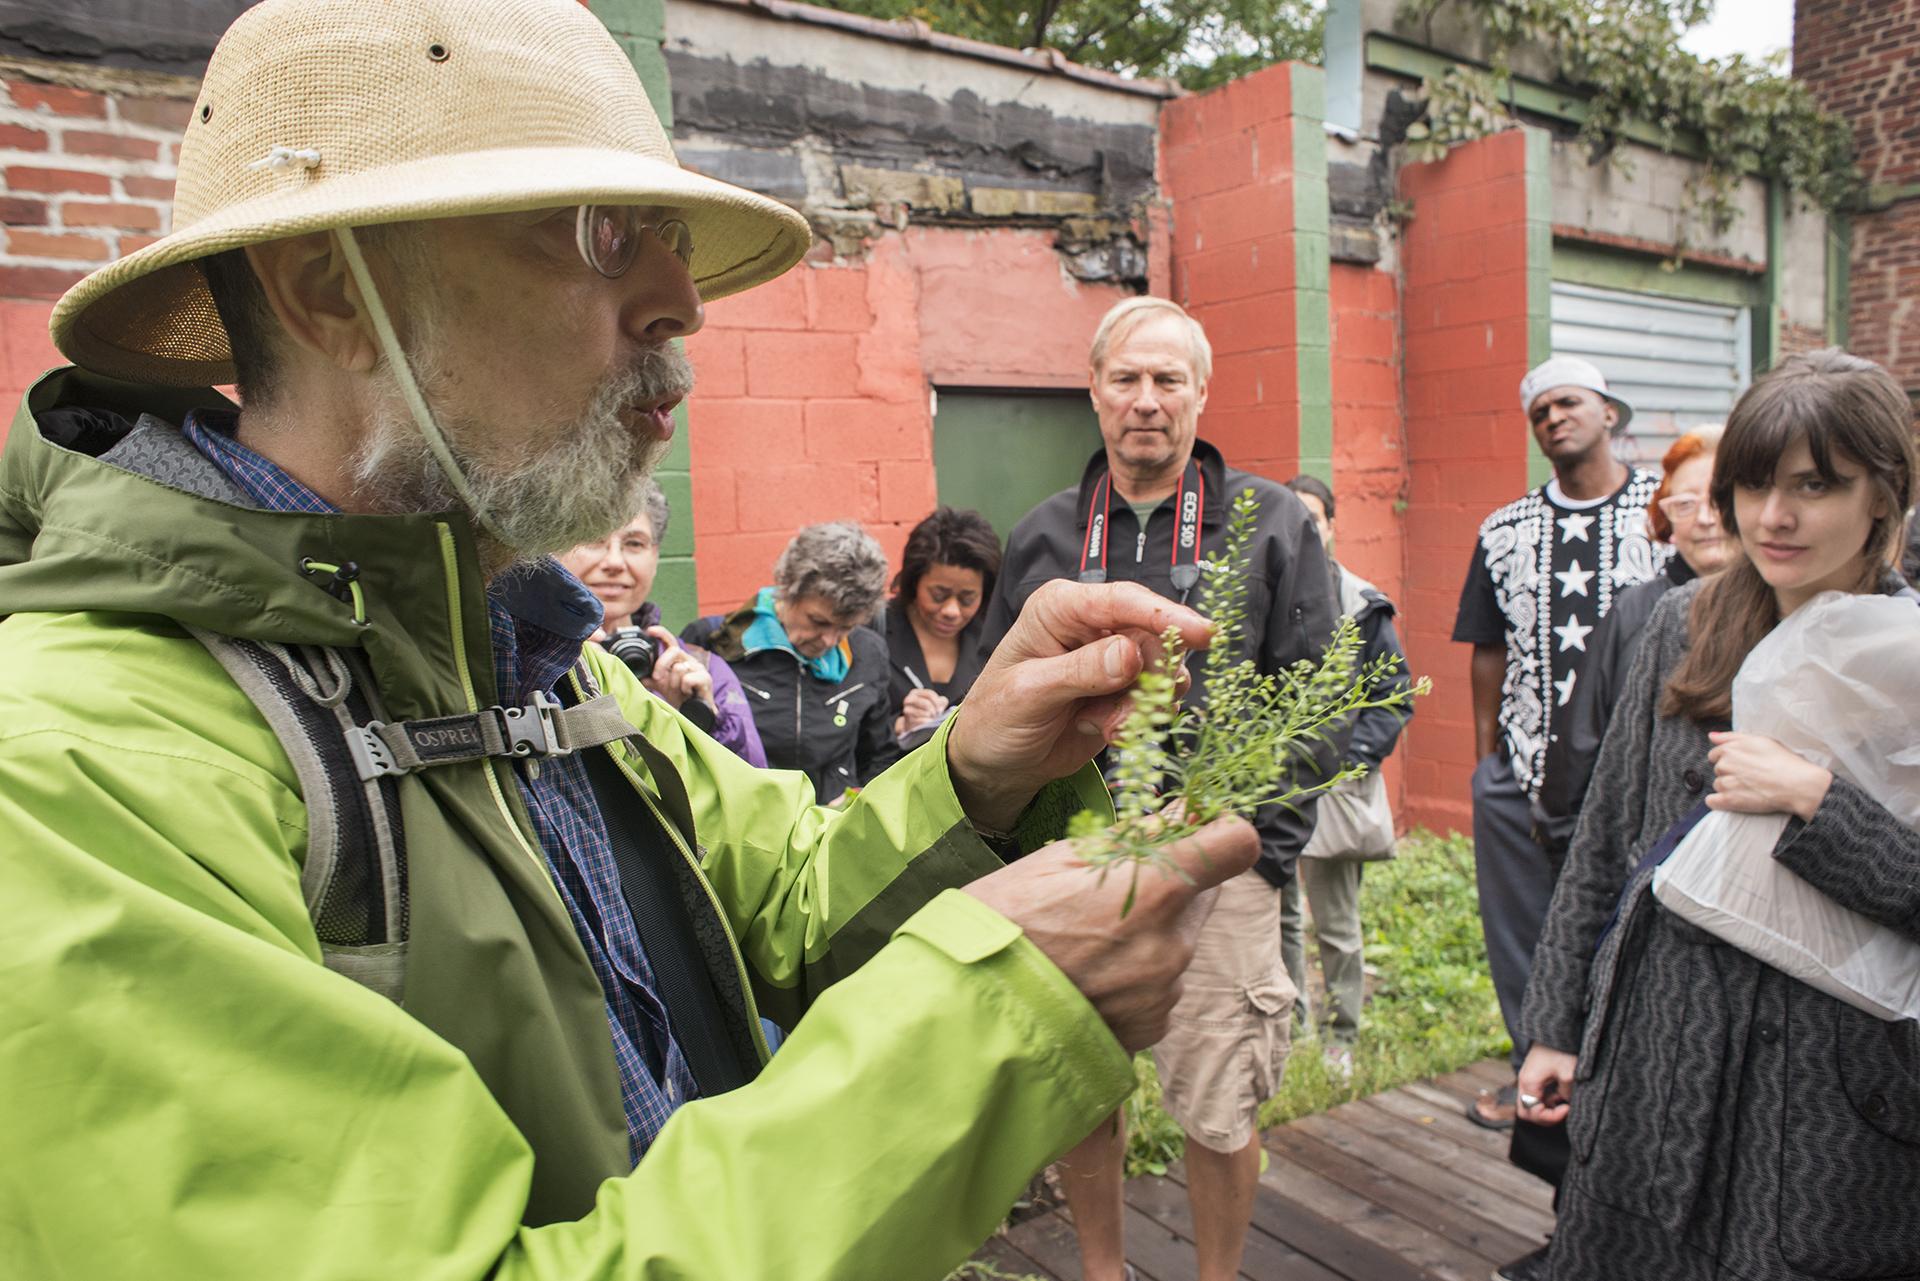 Harvesting, Cooking, Eating Wild Plants Workshop